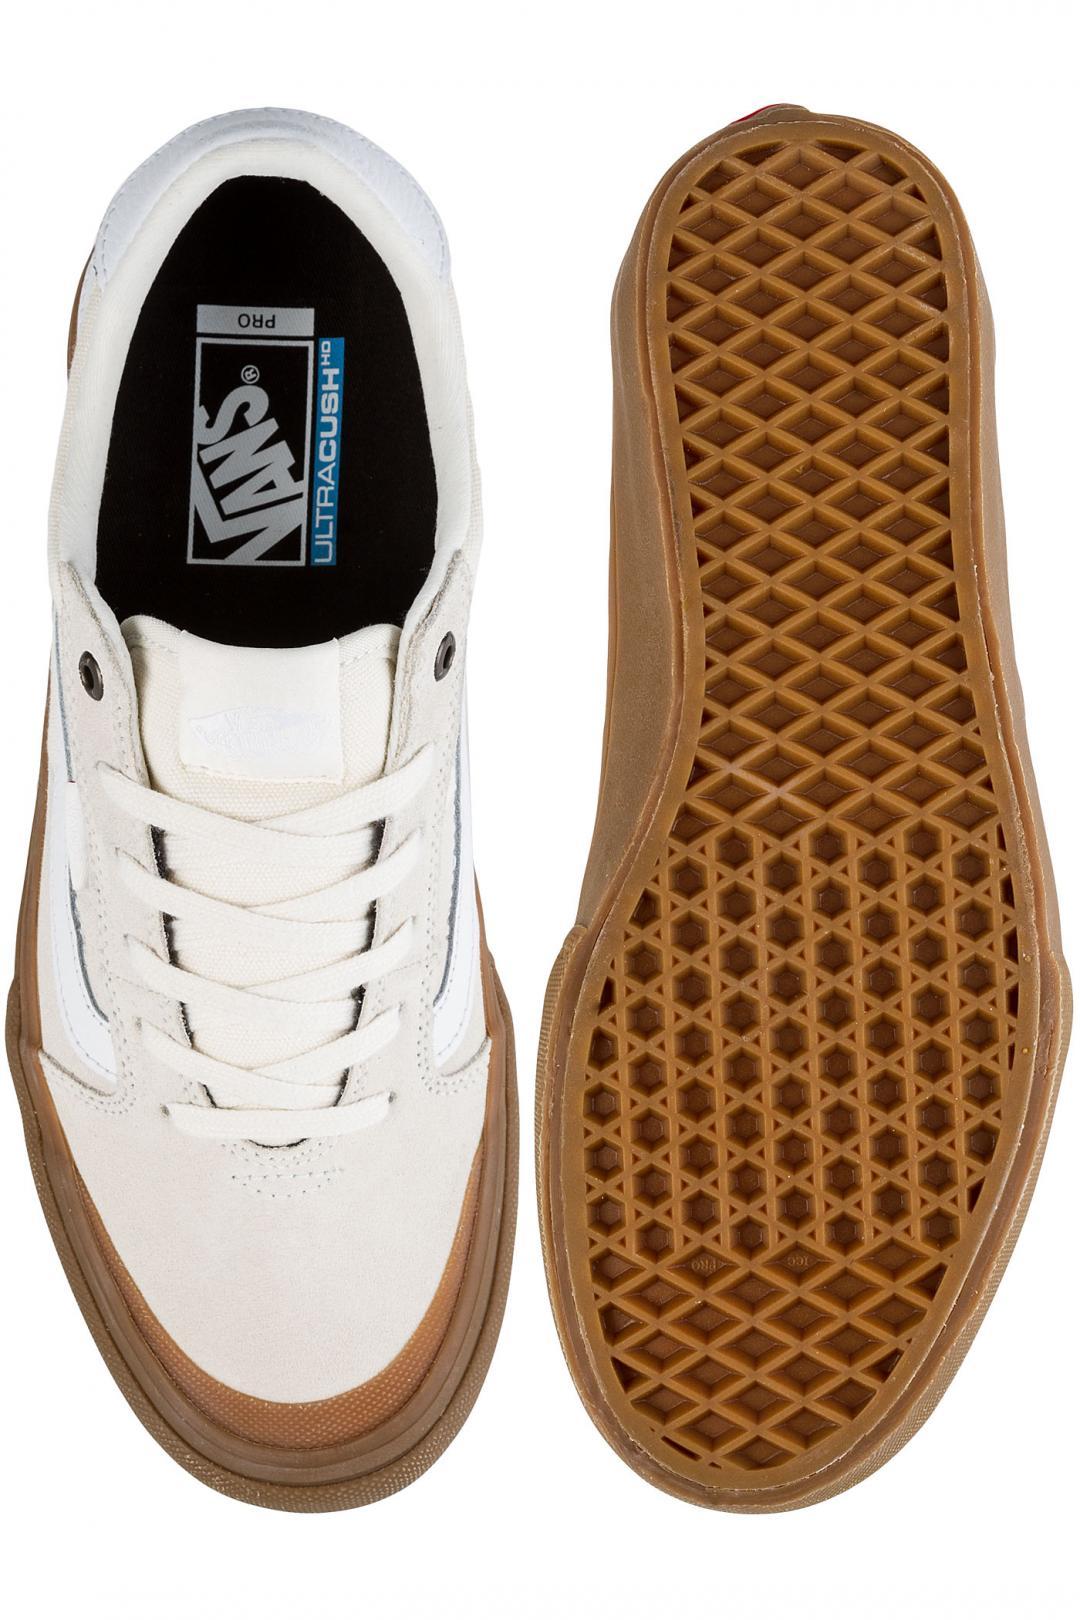 Uomo Vans Style 112 Pro marshmallow gum | Sneakers low top